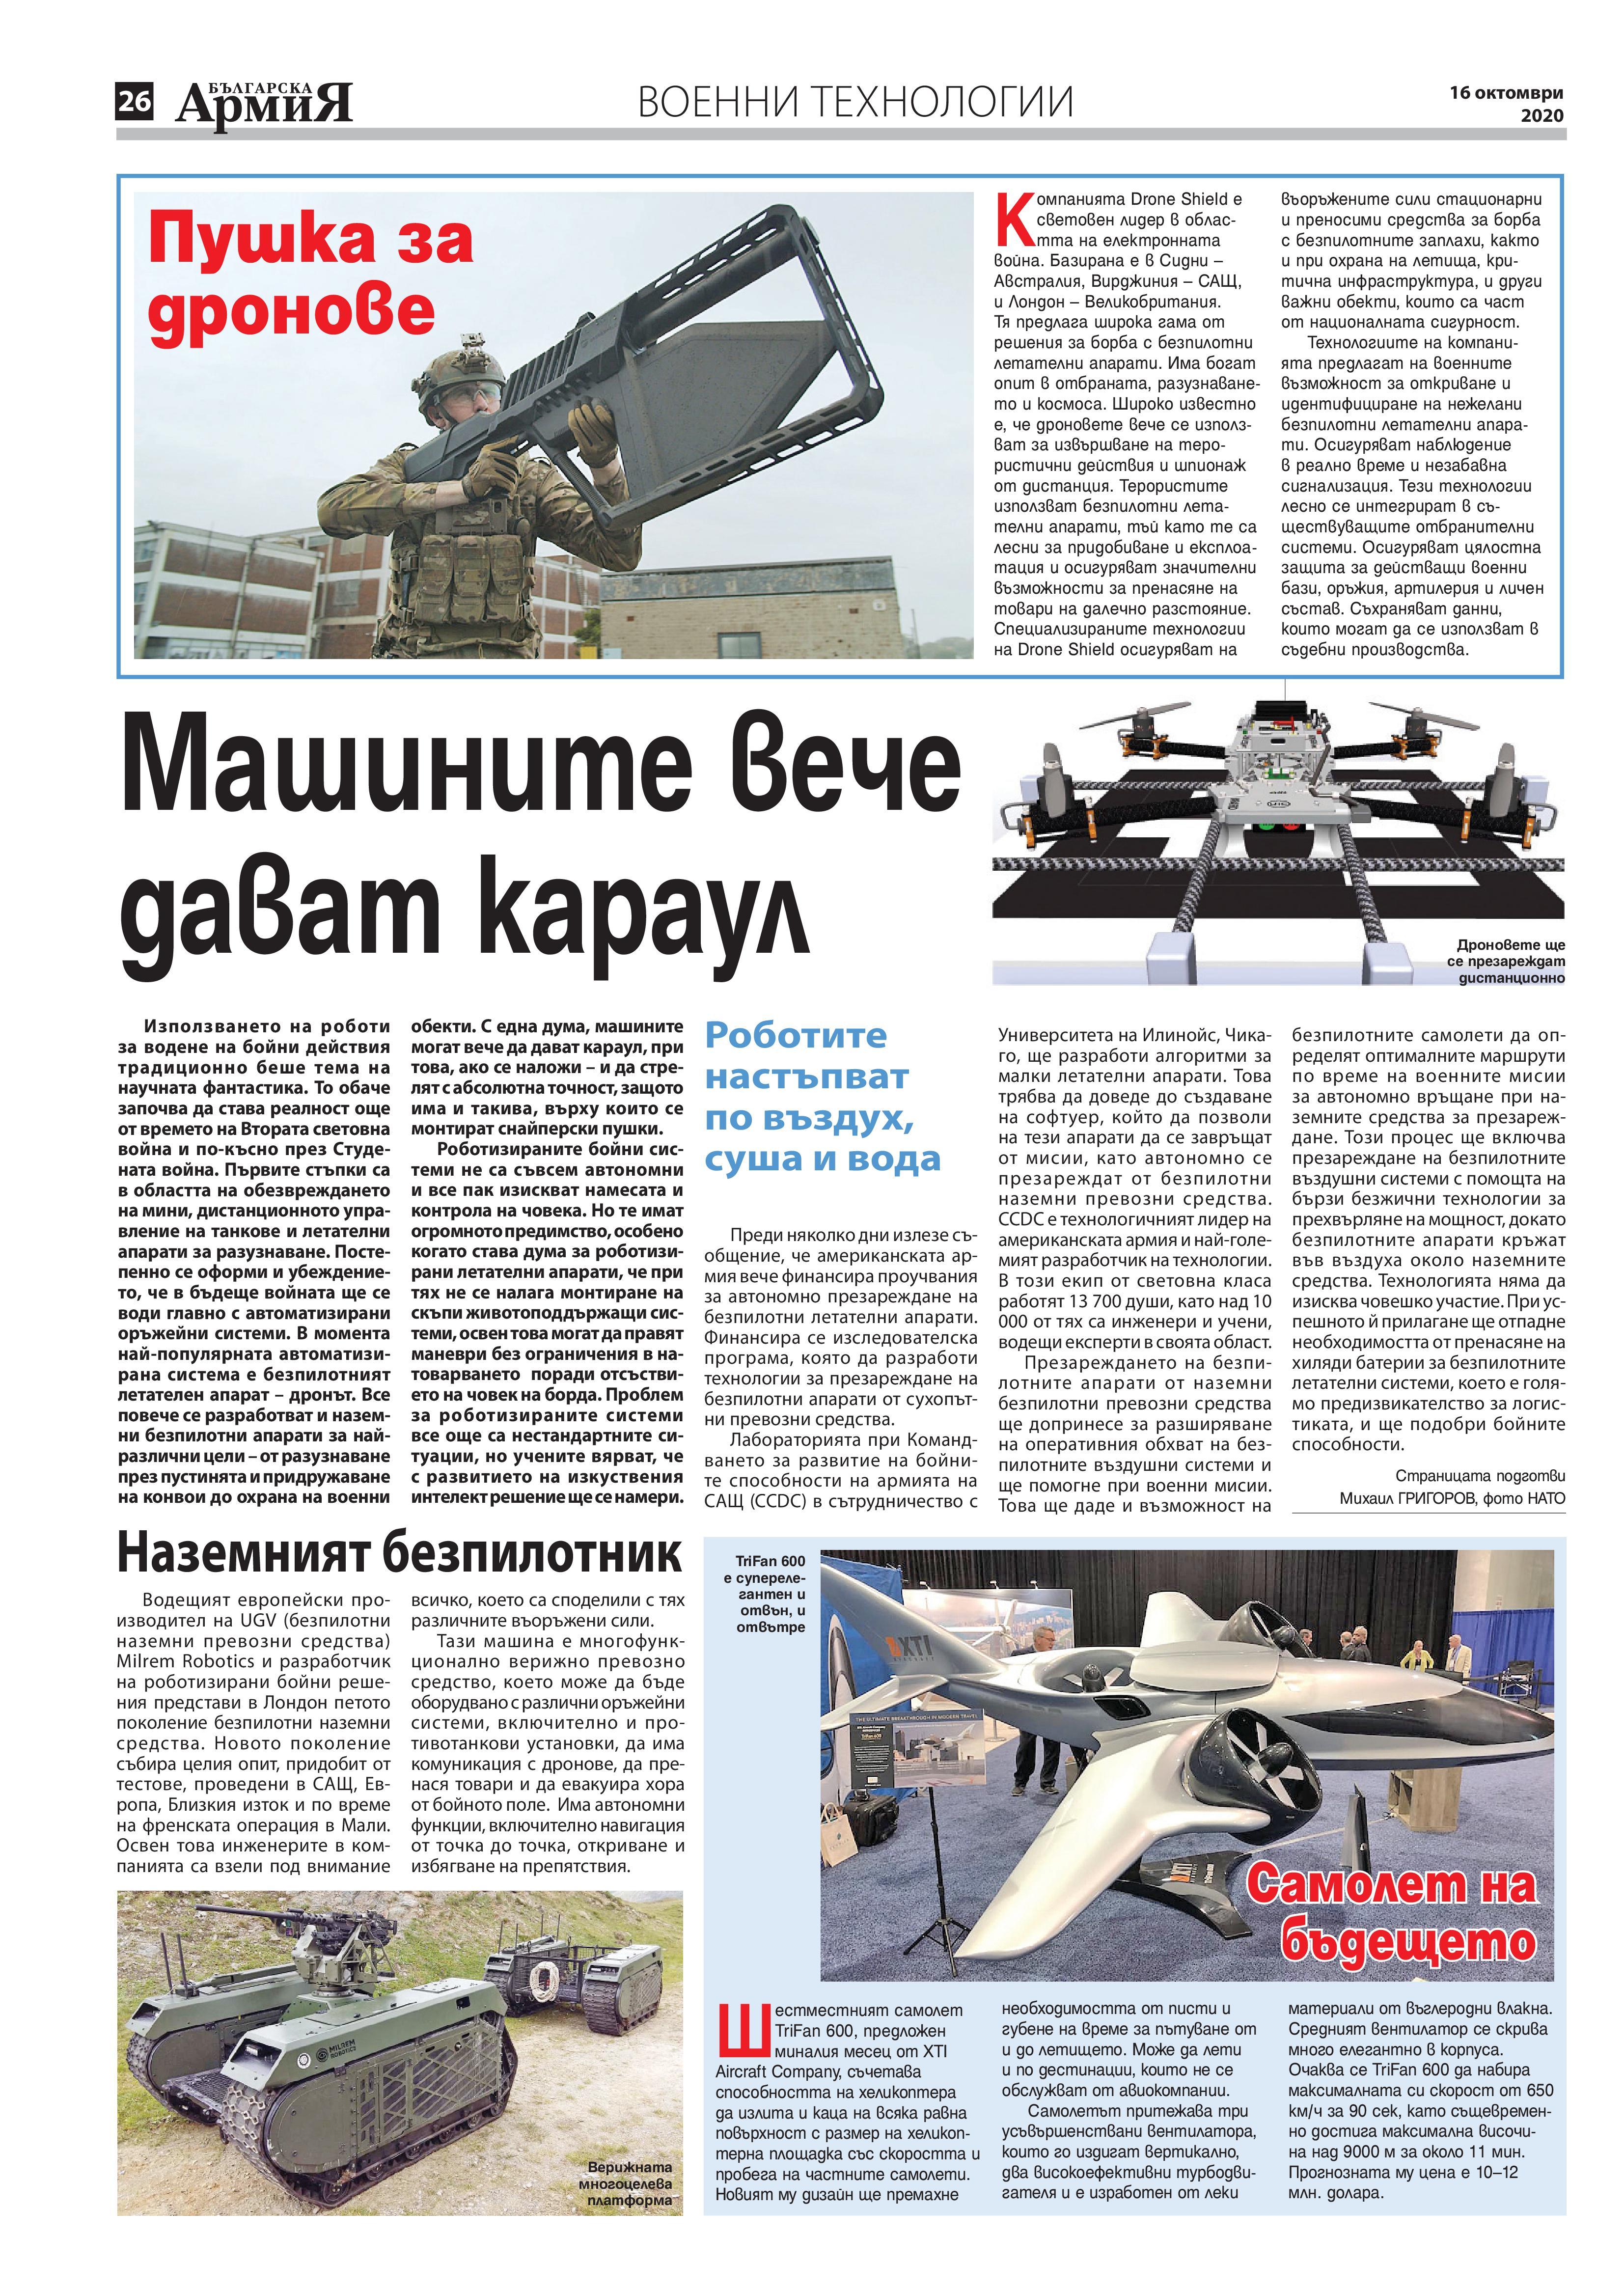 https://armymedia.bg/wp-content/uploads/2015/06/26-36.jpg